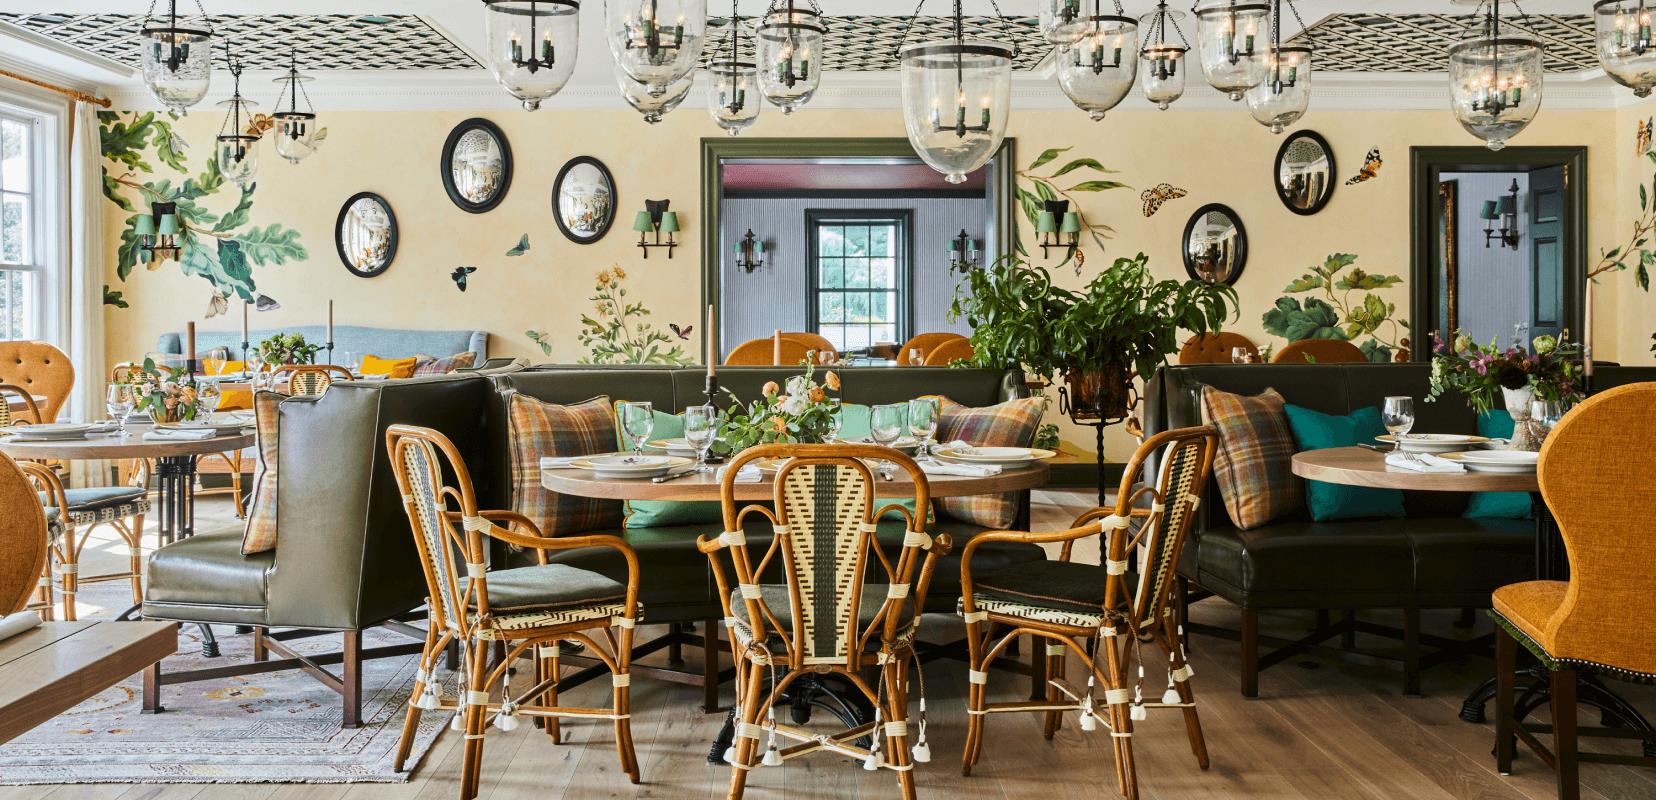 beautiful dining room interior